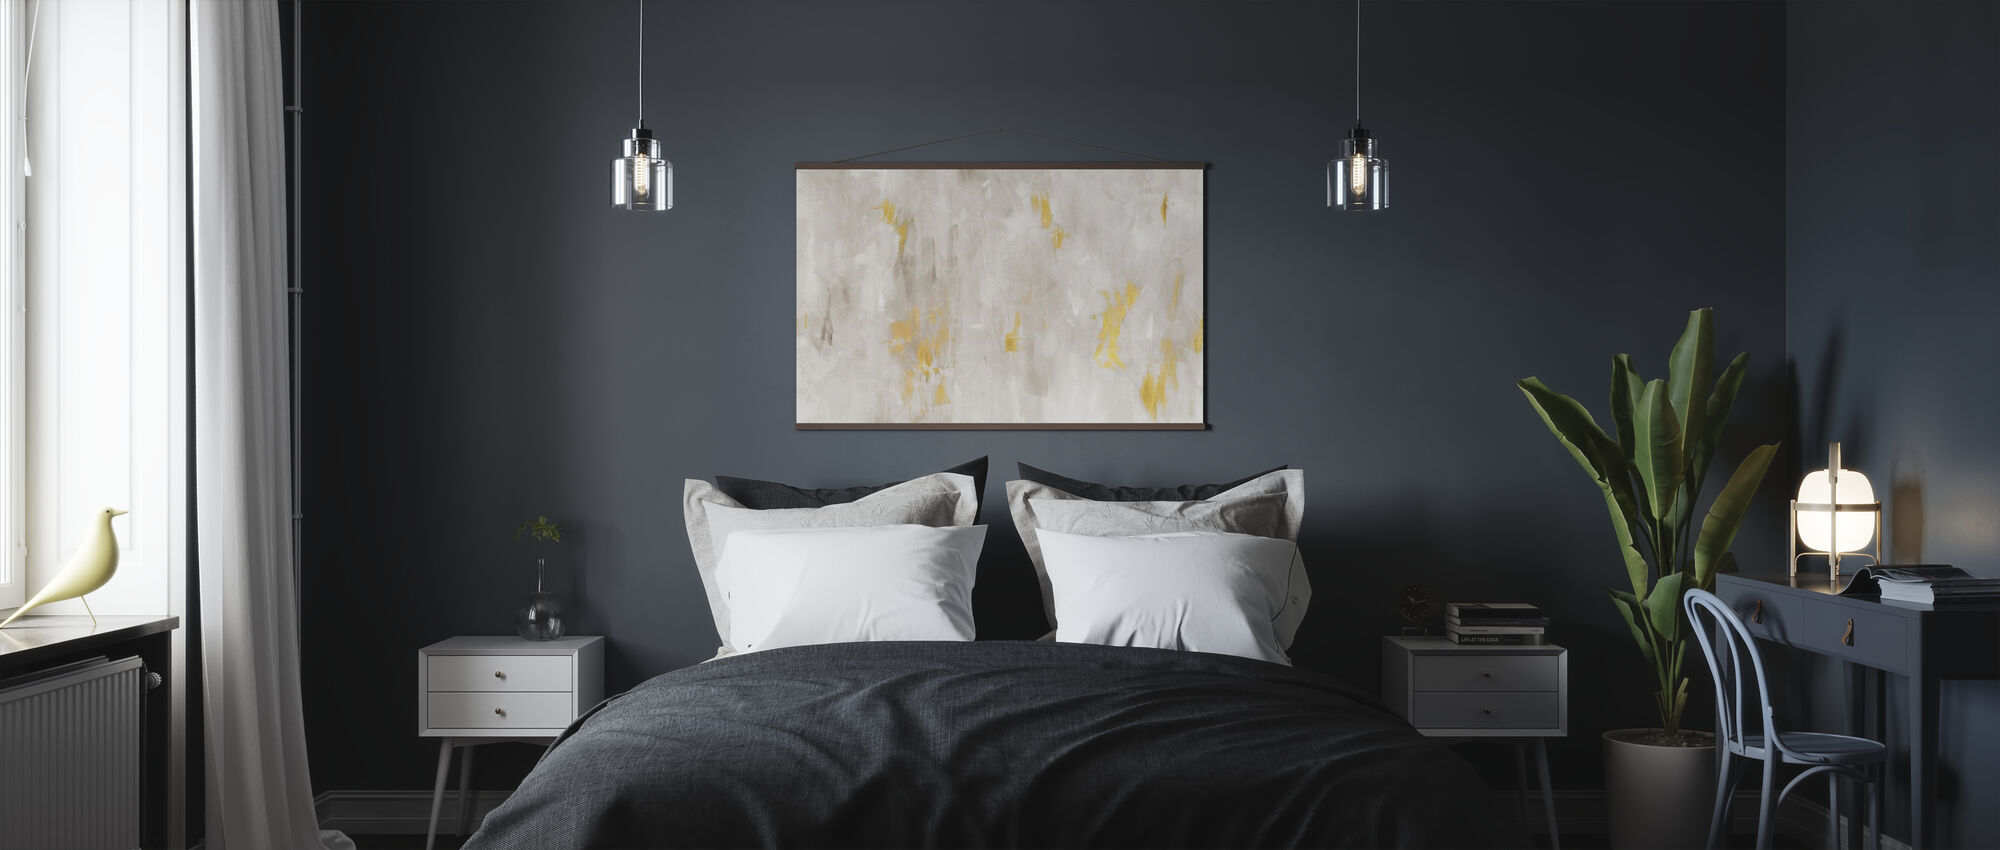 Brushed and Blushed - Poster - Bedroom